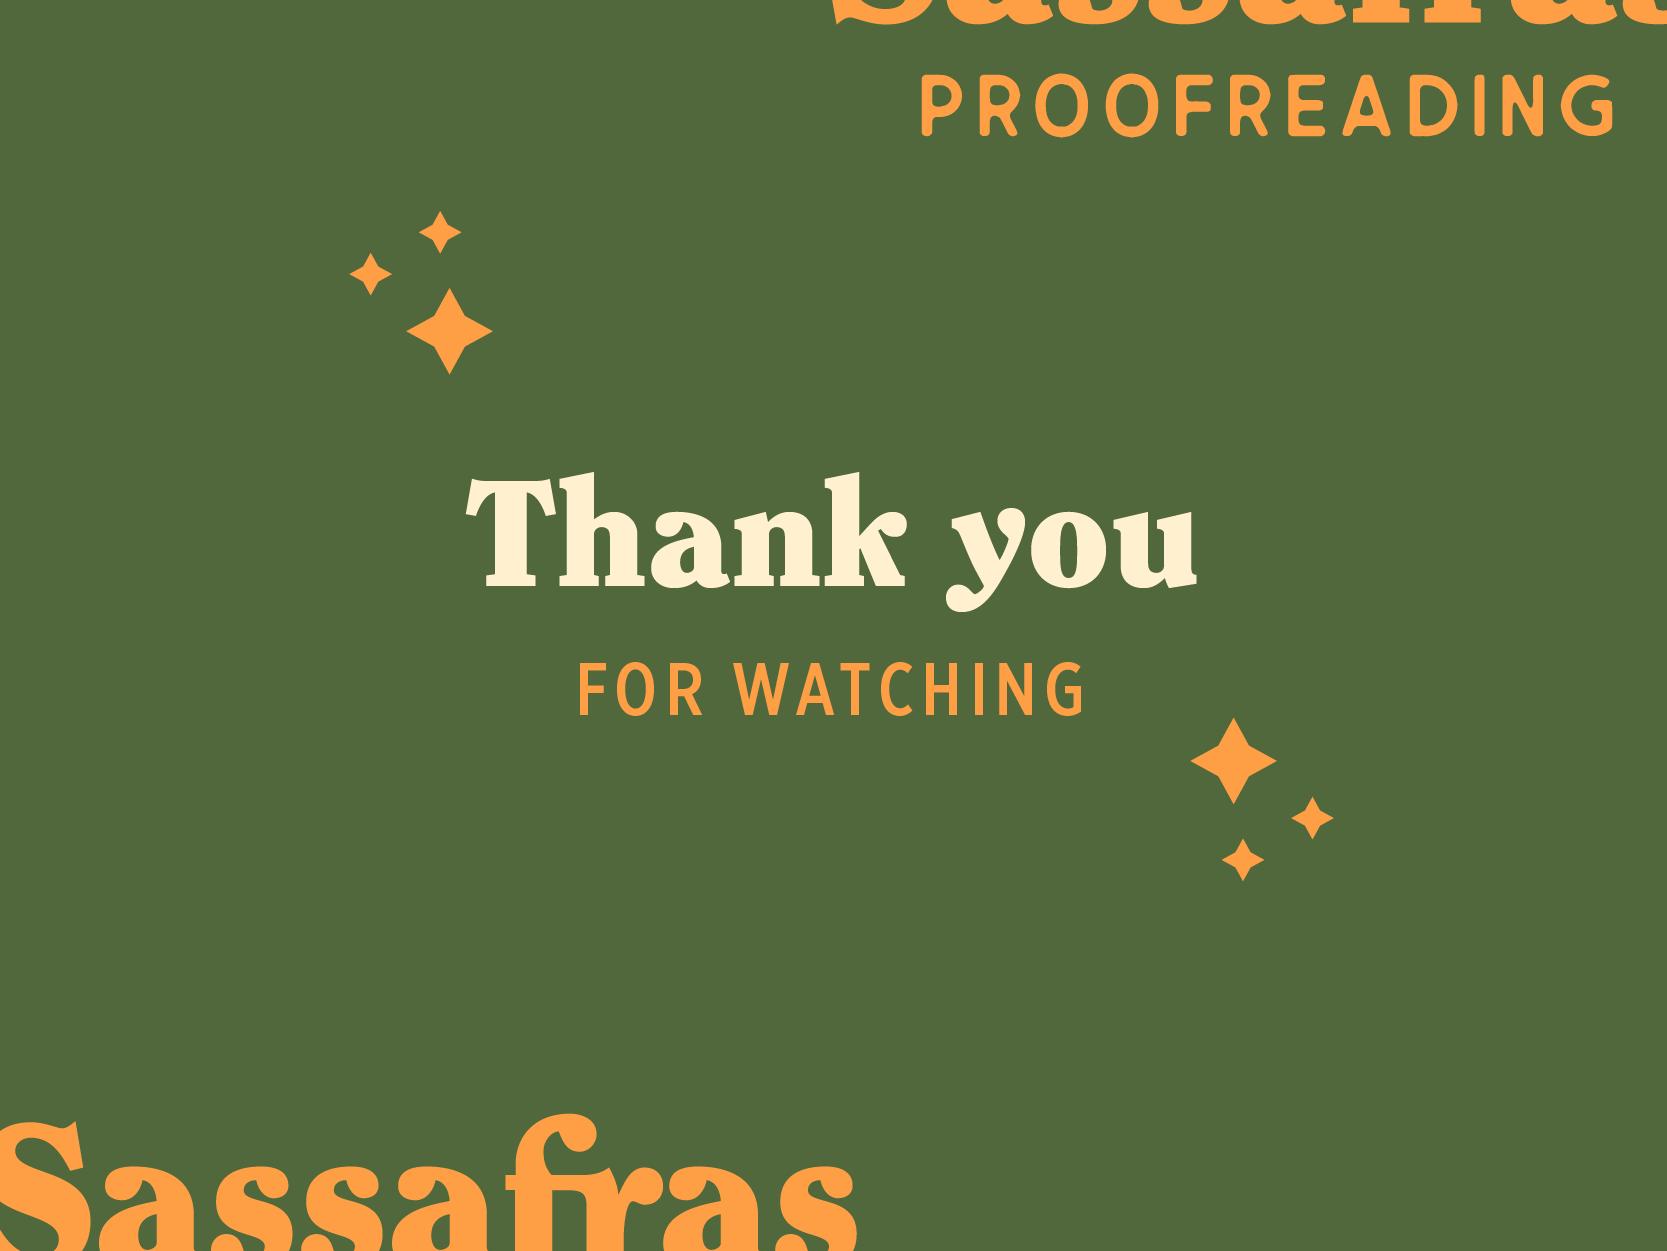 SASSAFRAS-10.png